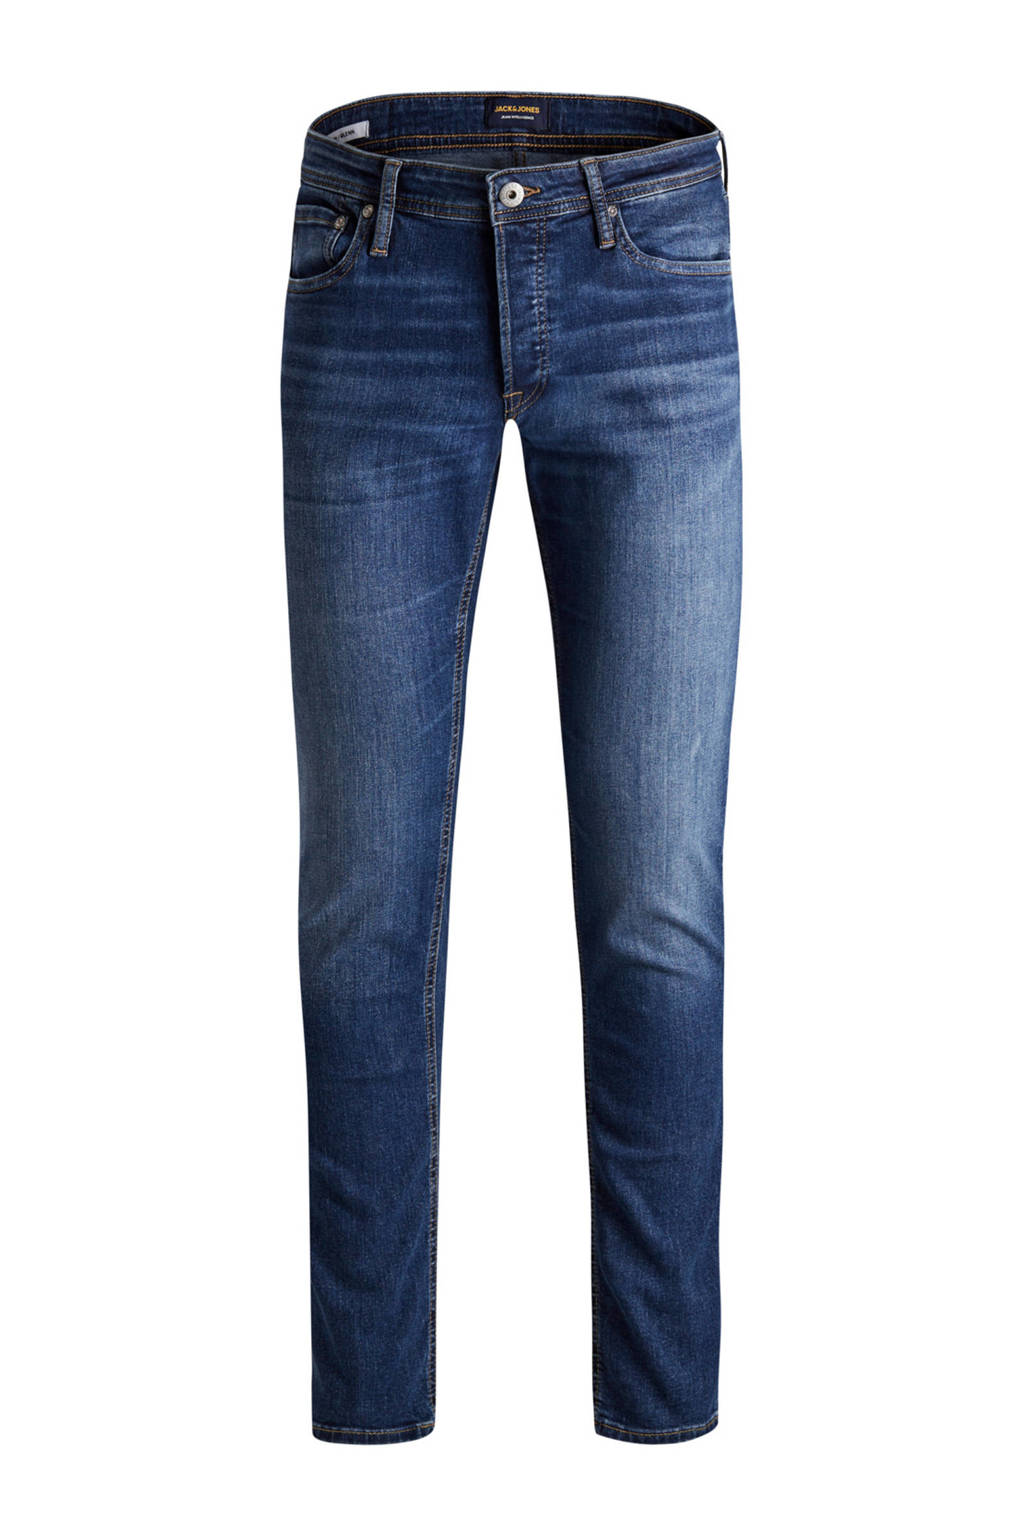 JACK & JONES JUNIOR slim fit jeans Glenn stonewashed, Stonewashed